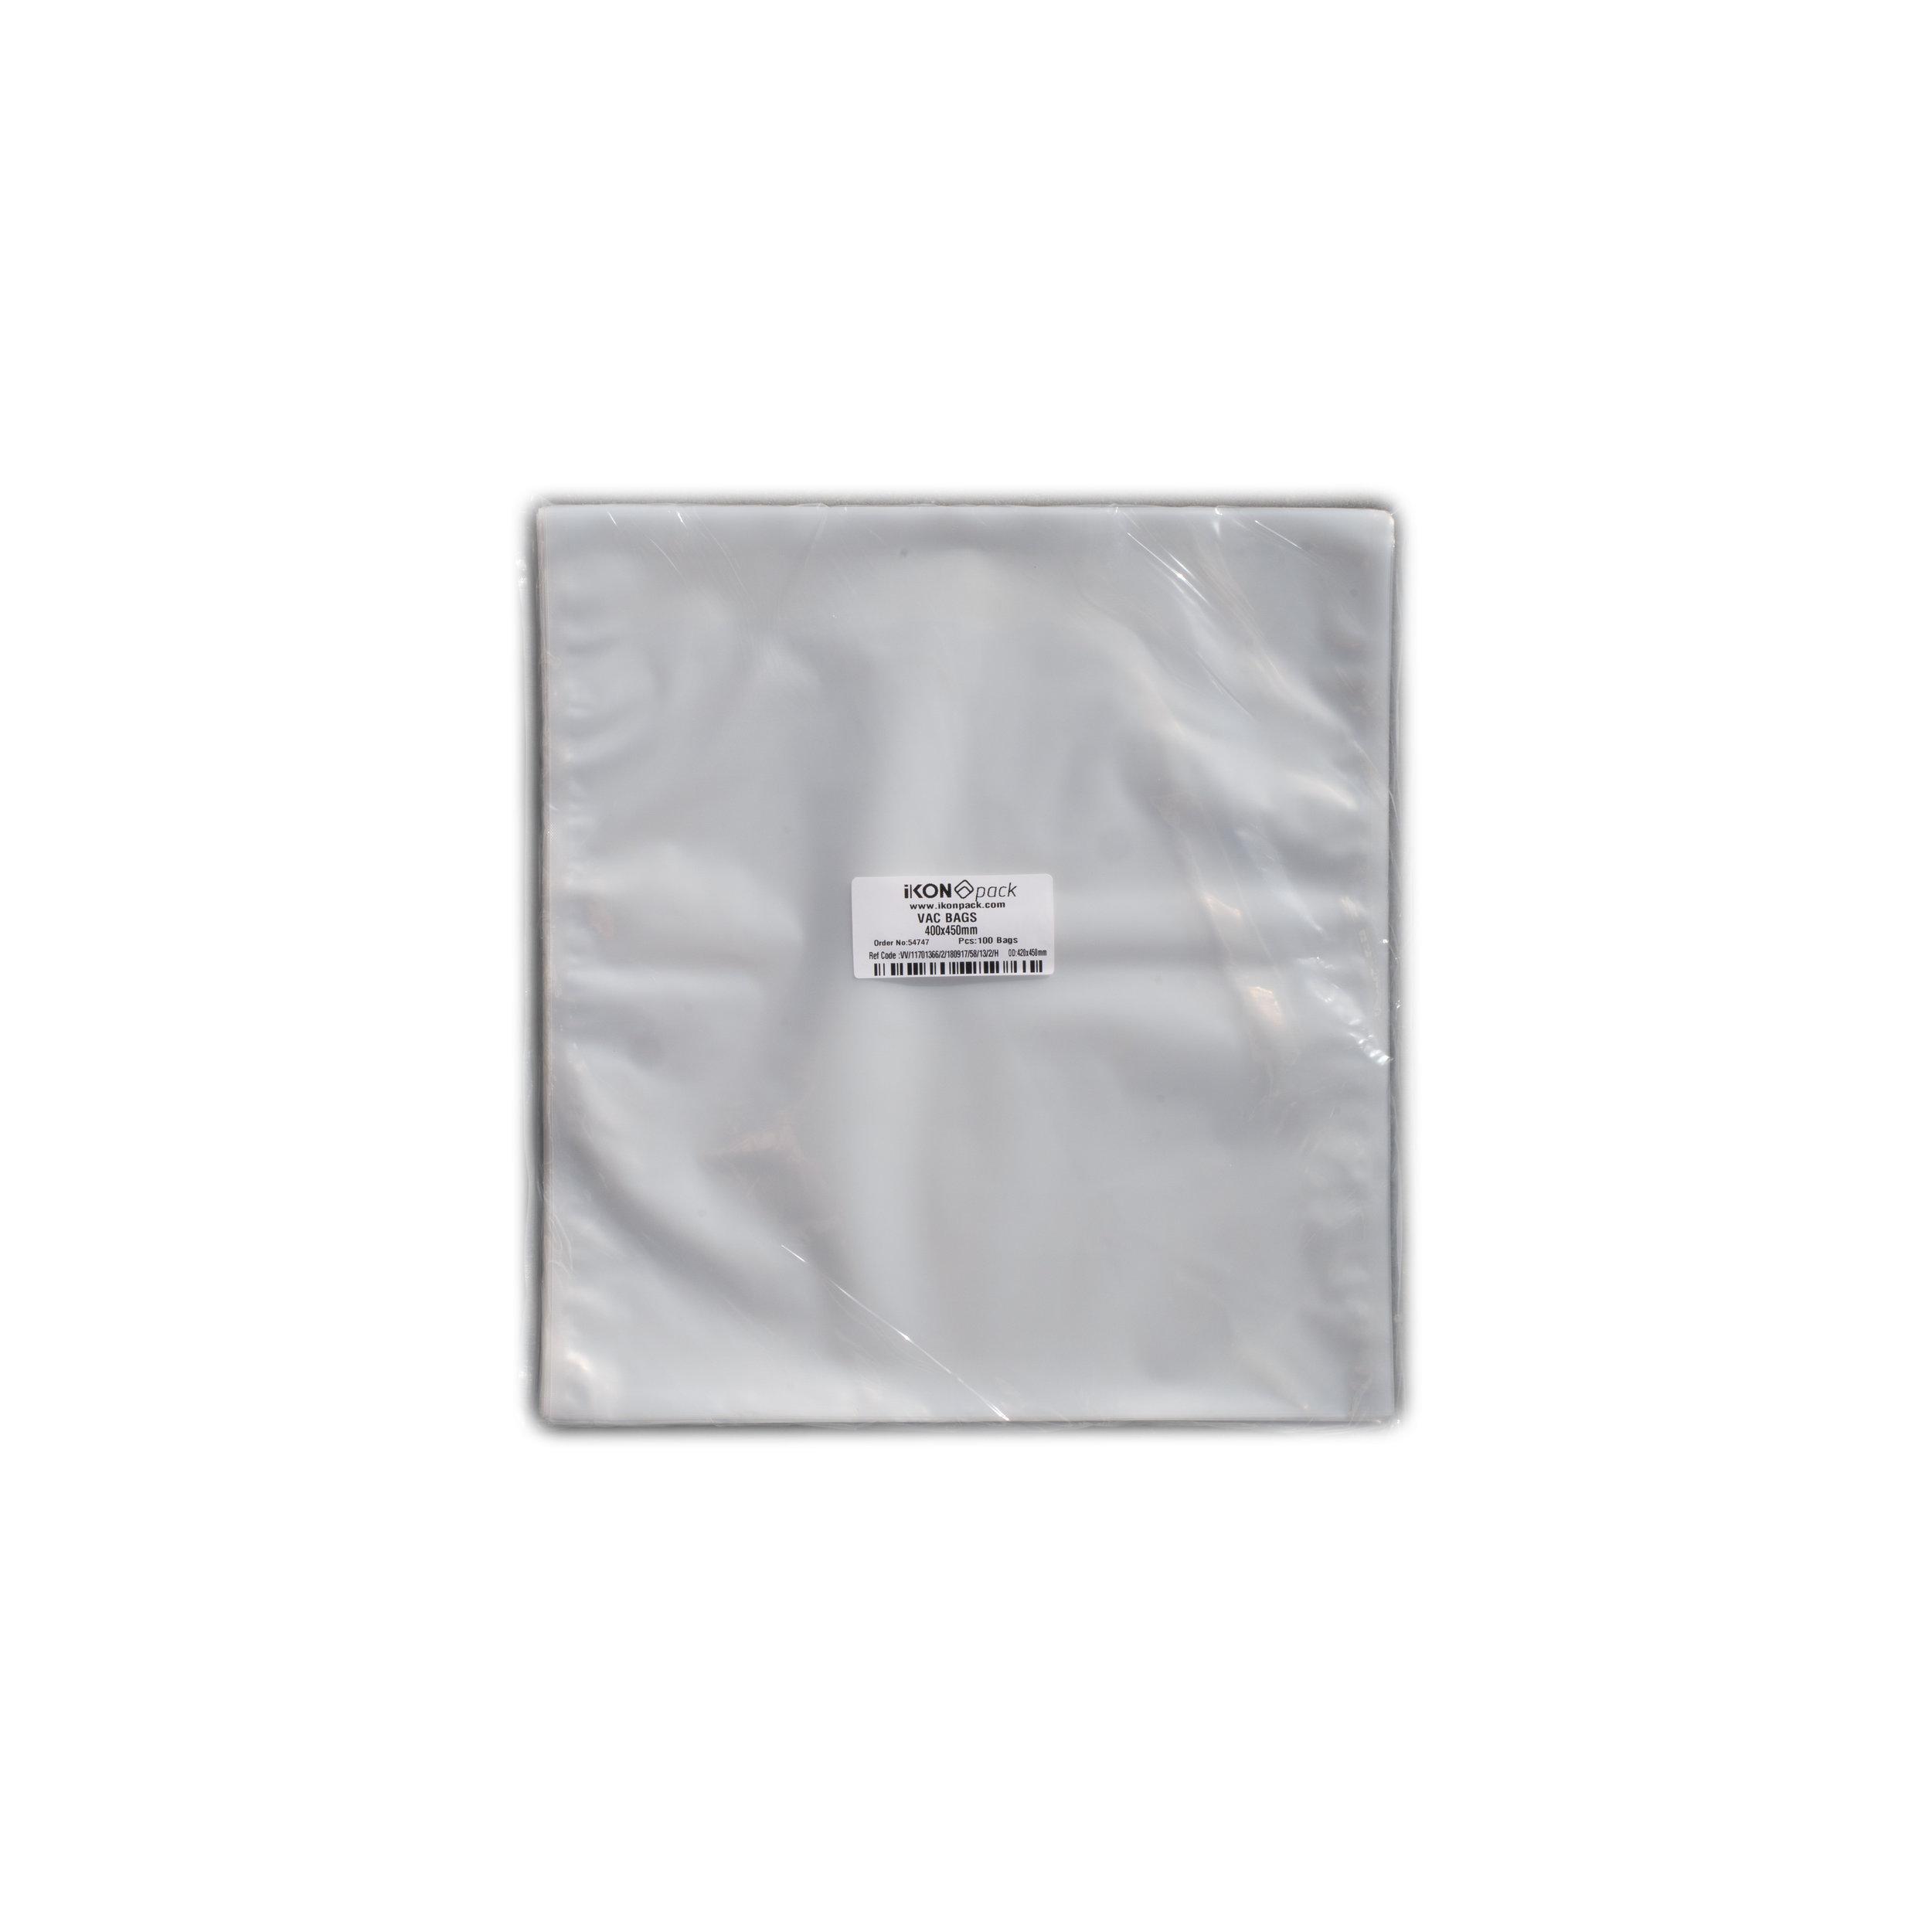 iK-VAC4045      VACUUM POUCH 70 MICRON 400X450    100 per slv 500 per carton